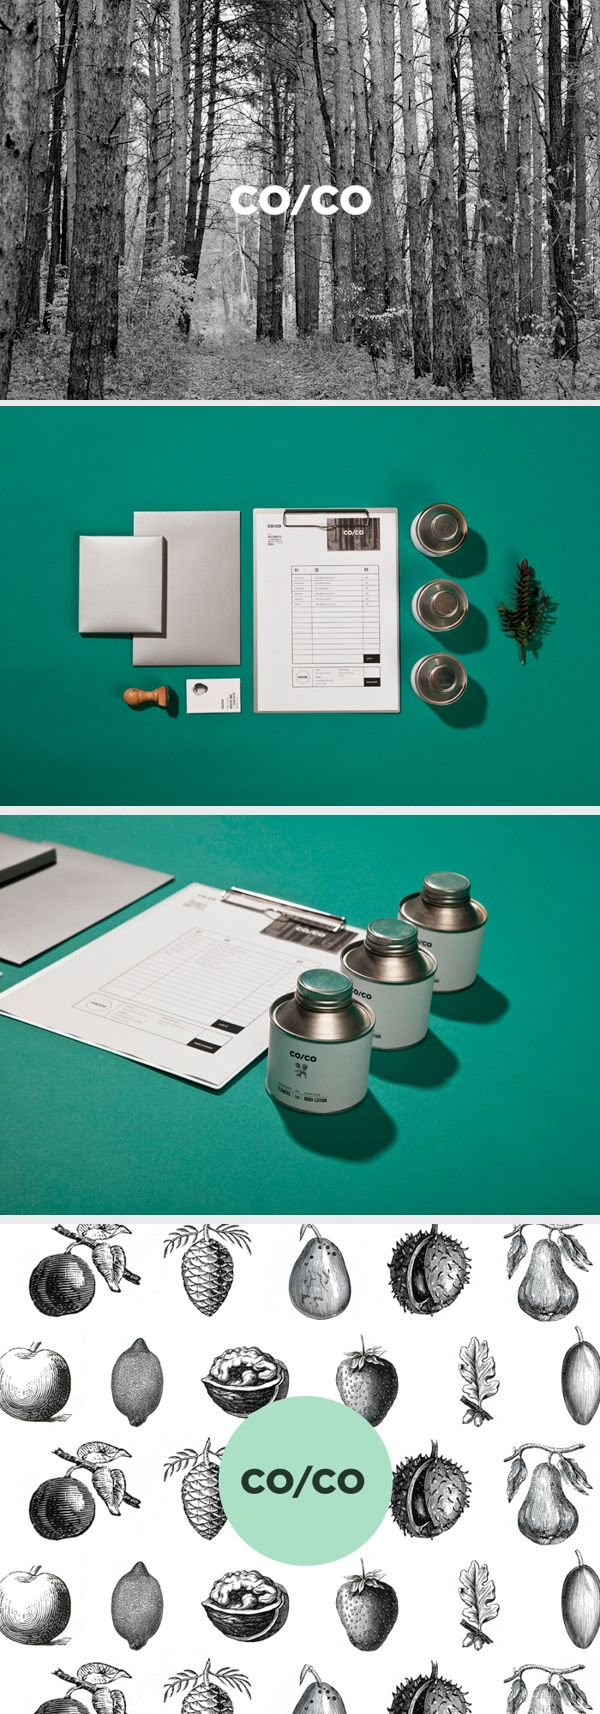 CO/CO Organic Cosmetics branding by Tatabi Studio